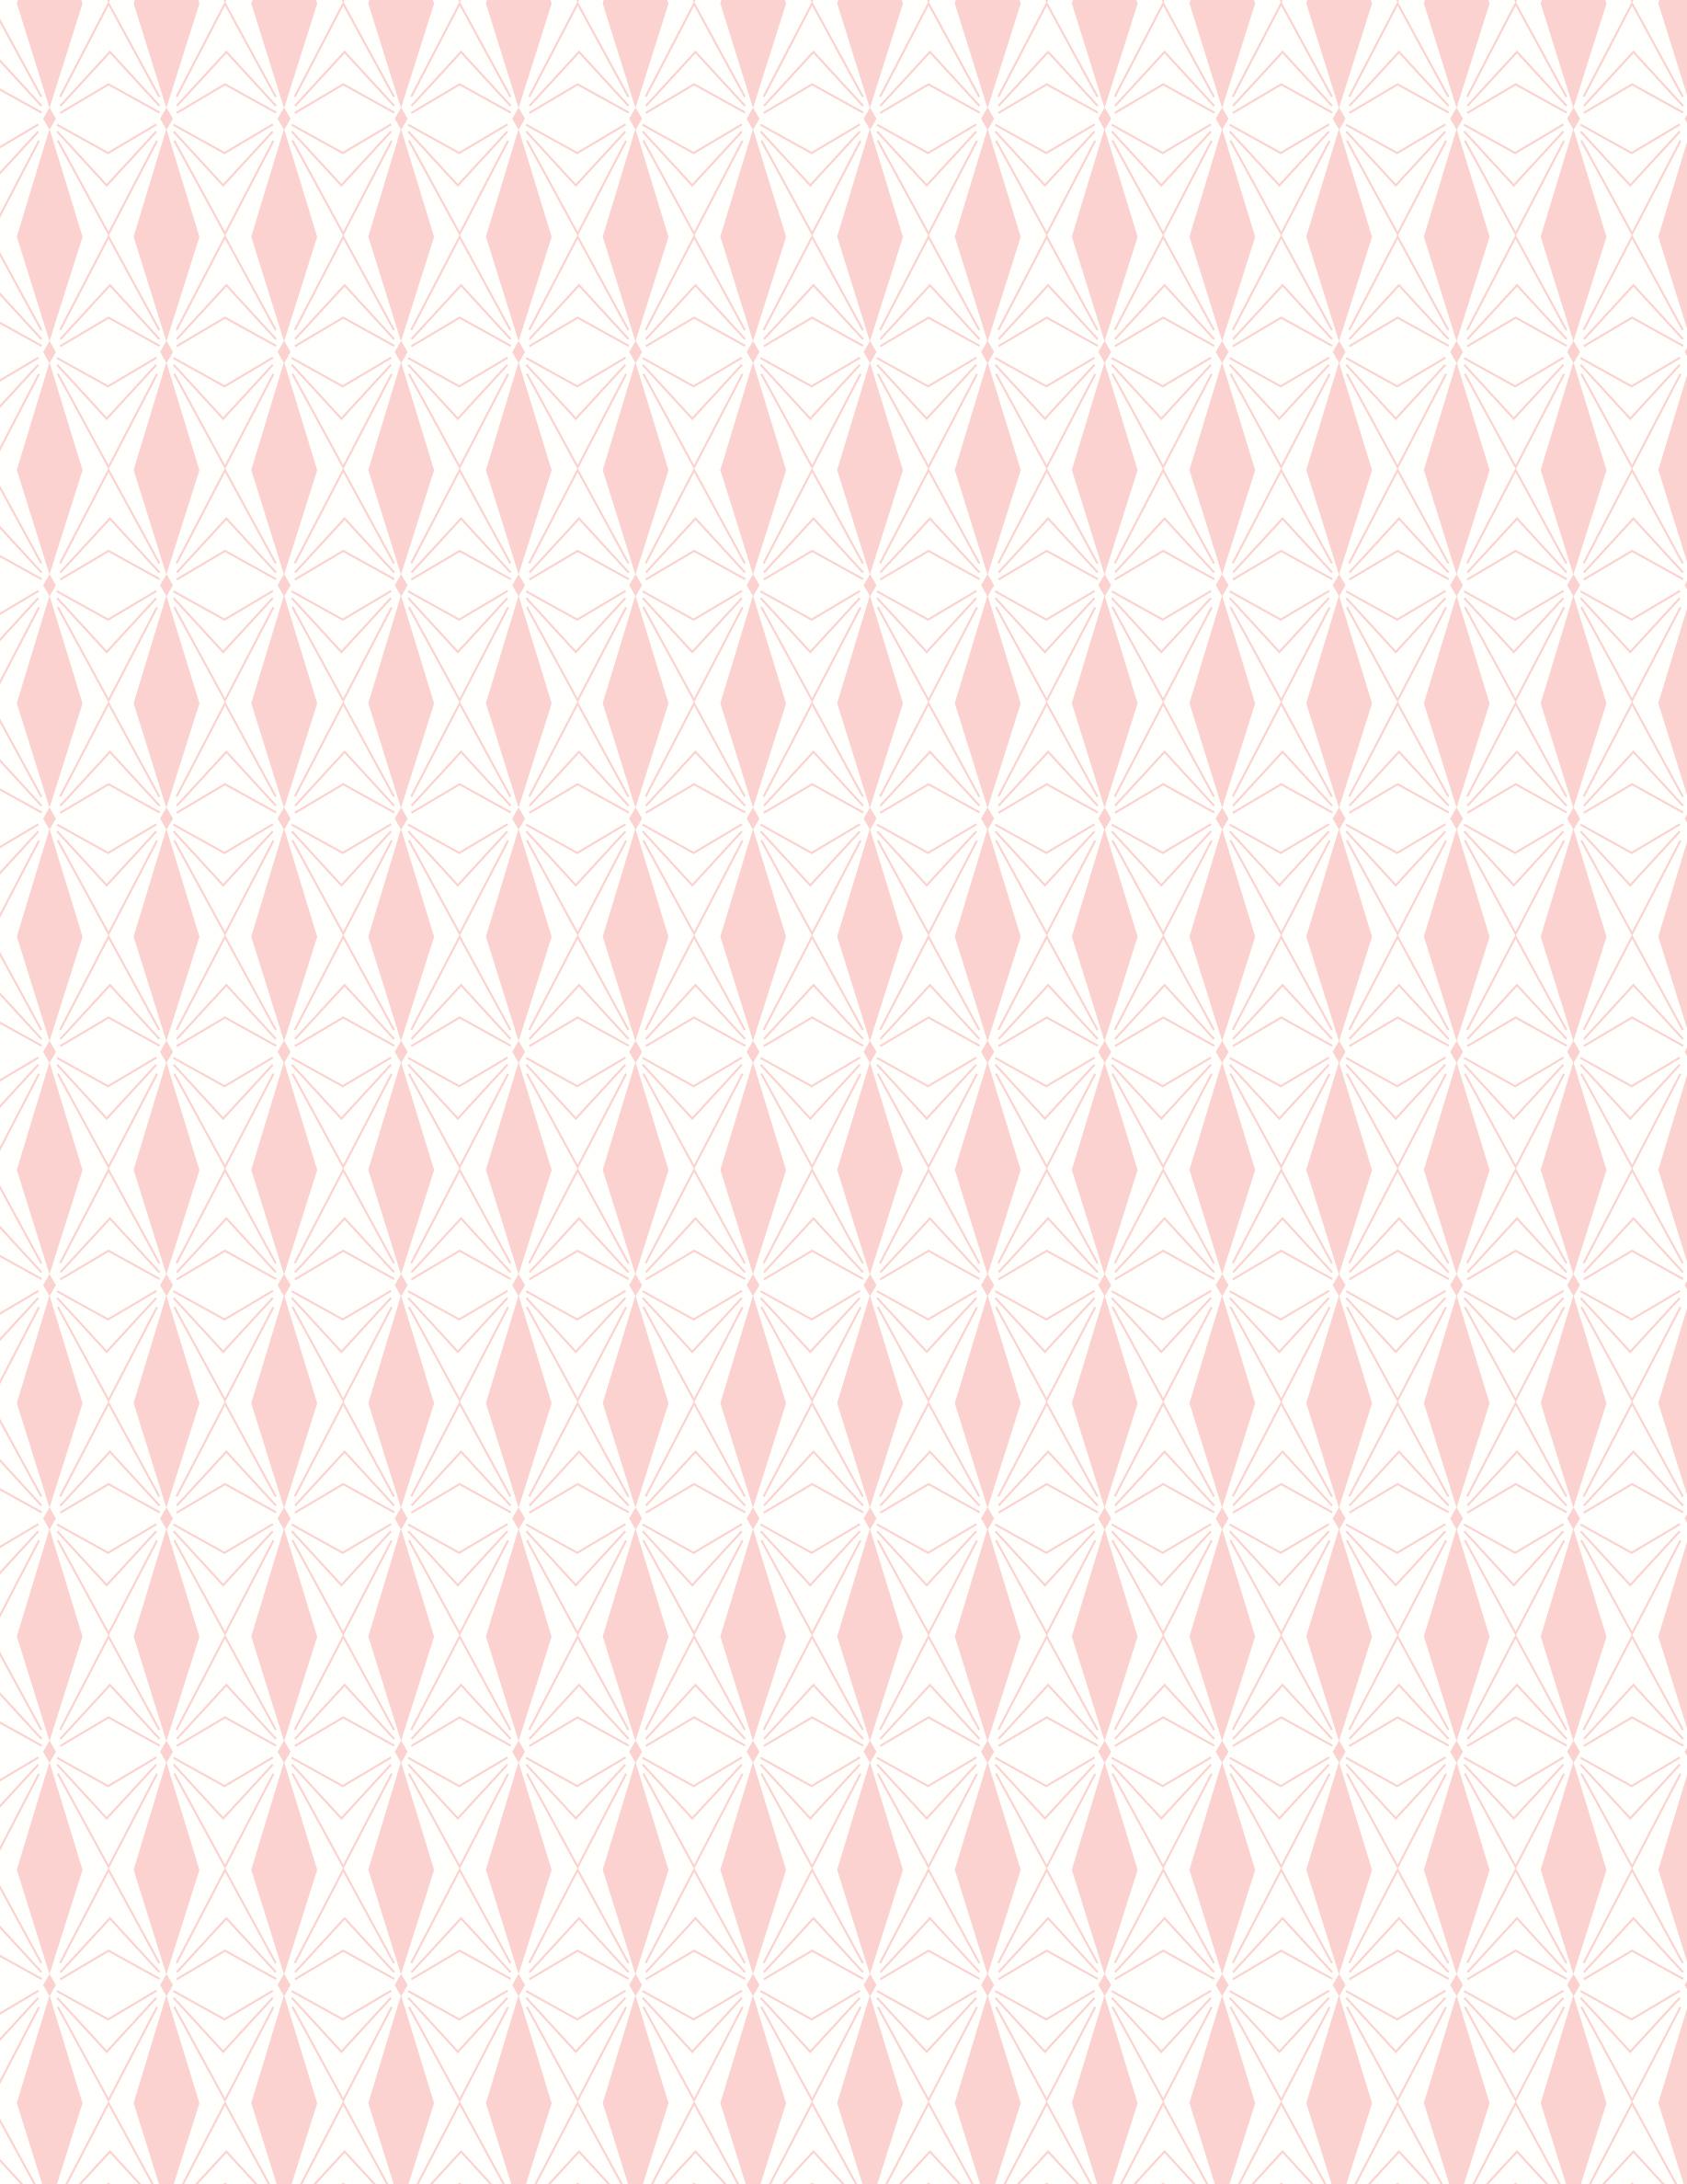 Diamond Pattern by Tessie Fay